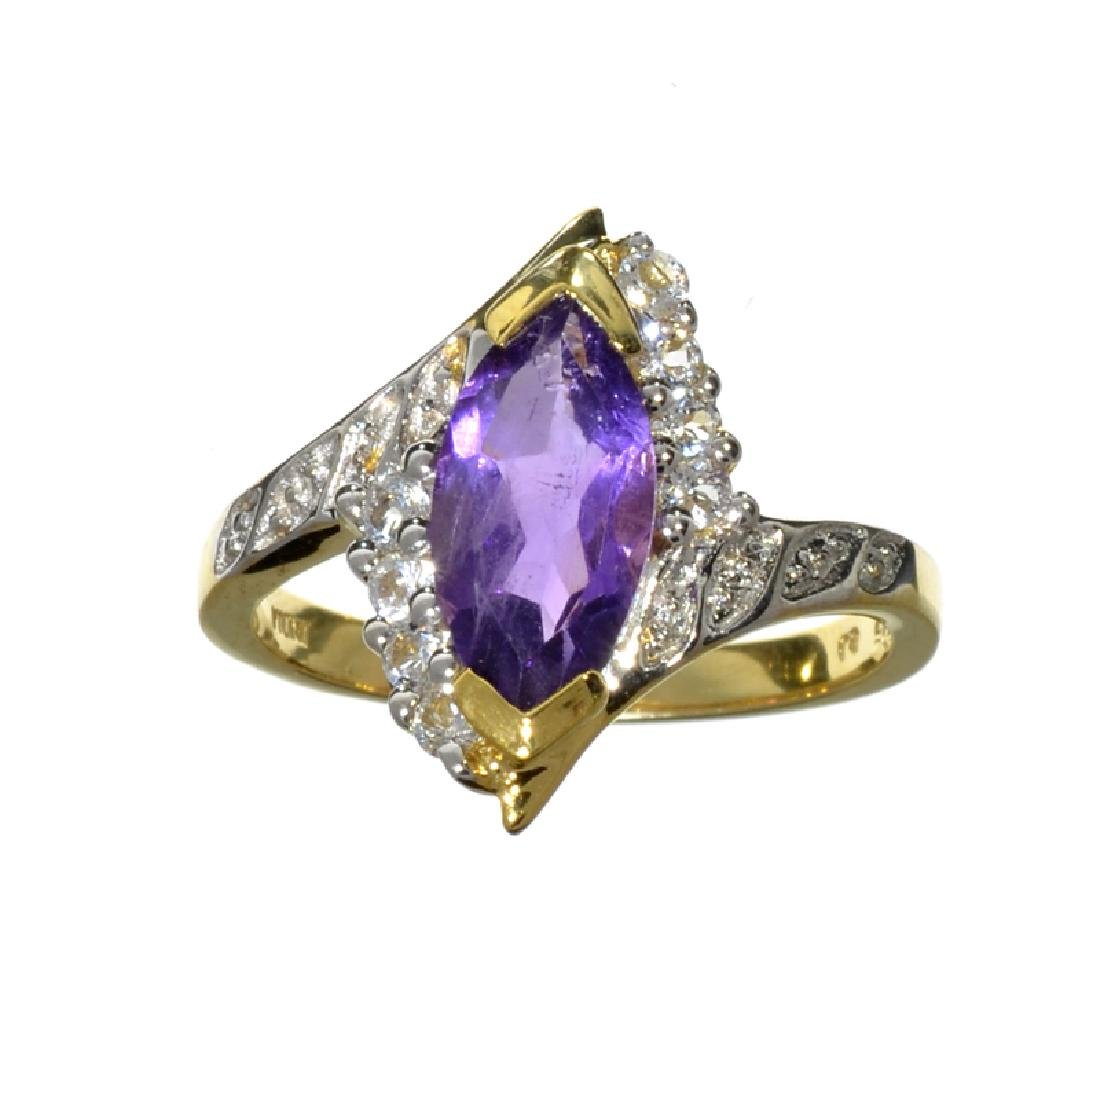 APP: 0.8k Fine Jewelry 1.75CT Purple Amethyst Quartz